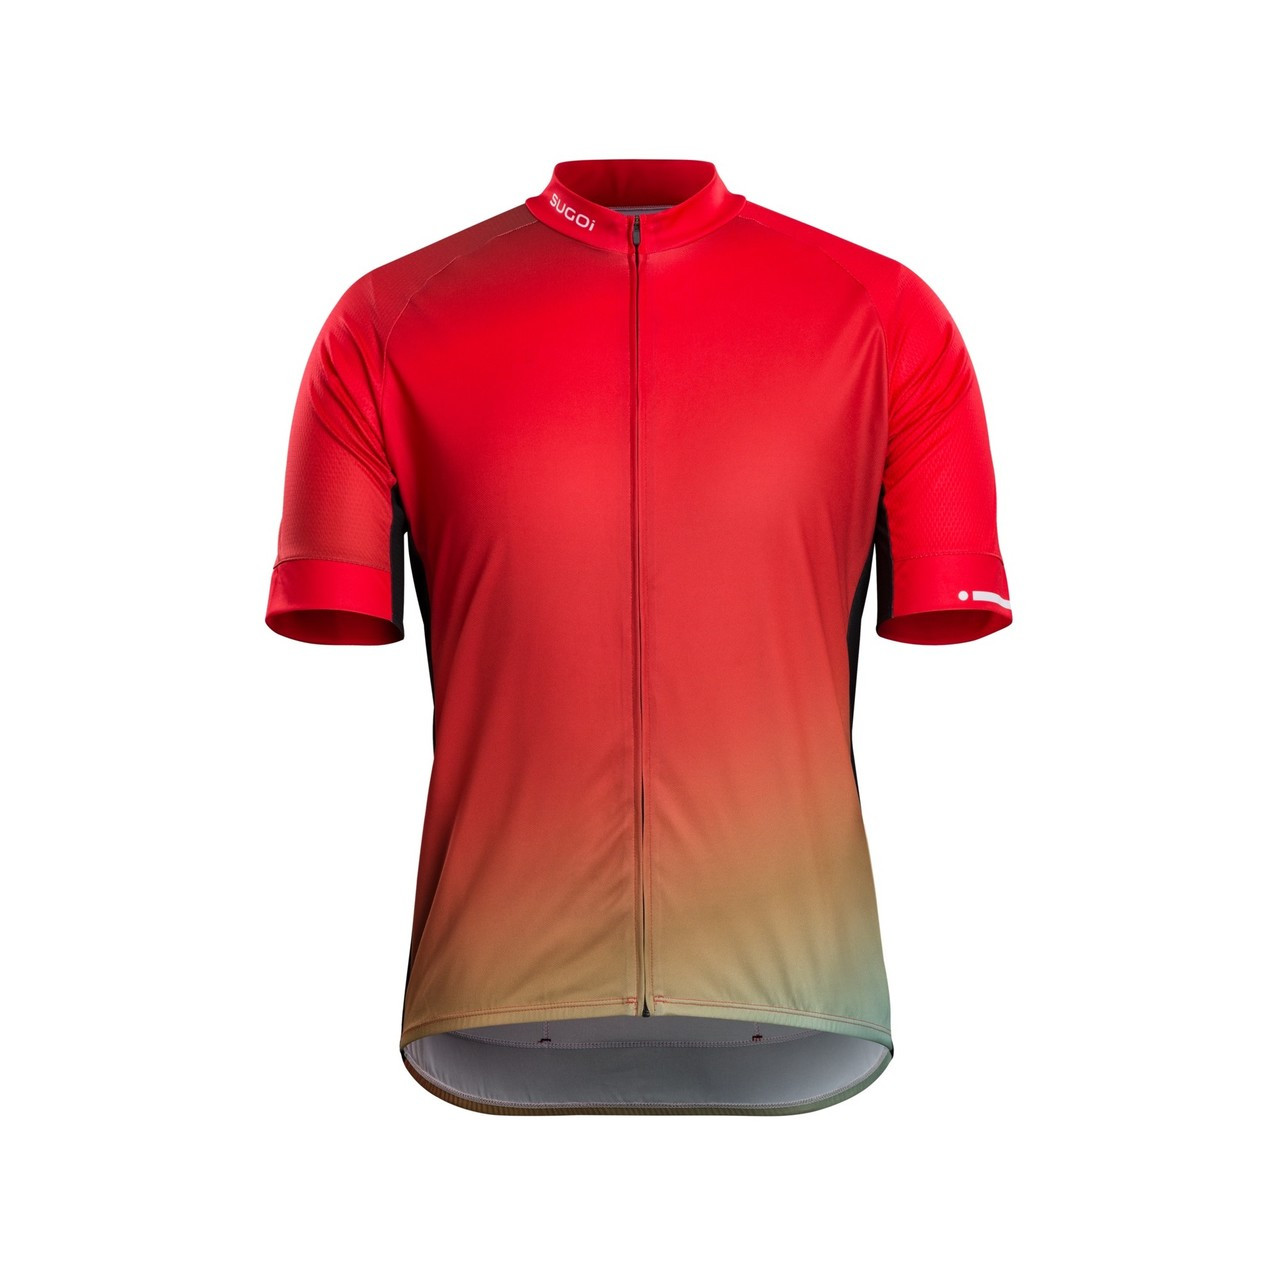 Sugoi Men's Evolution Zap Bike Jersey - 2019 price